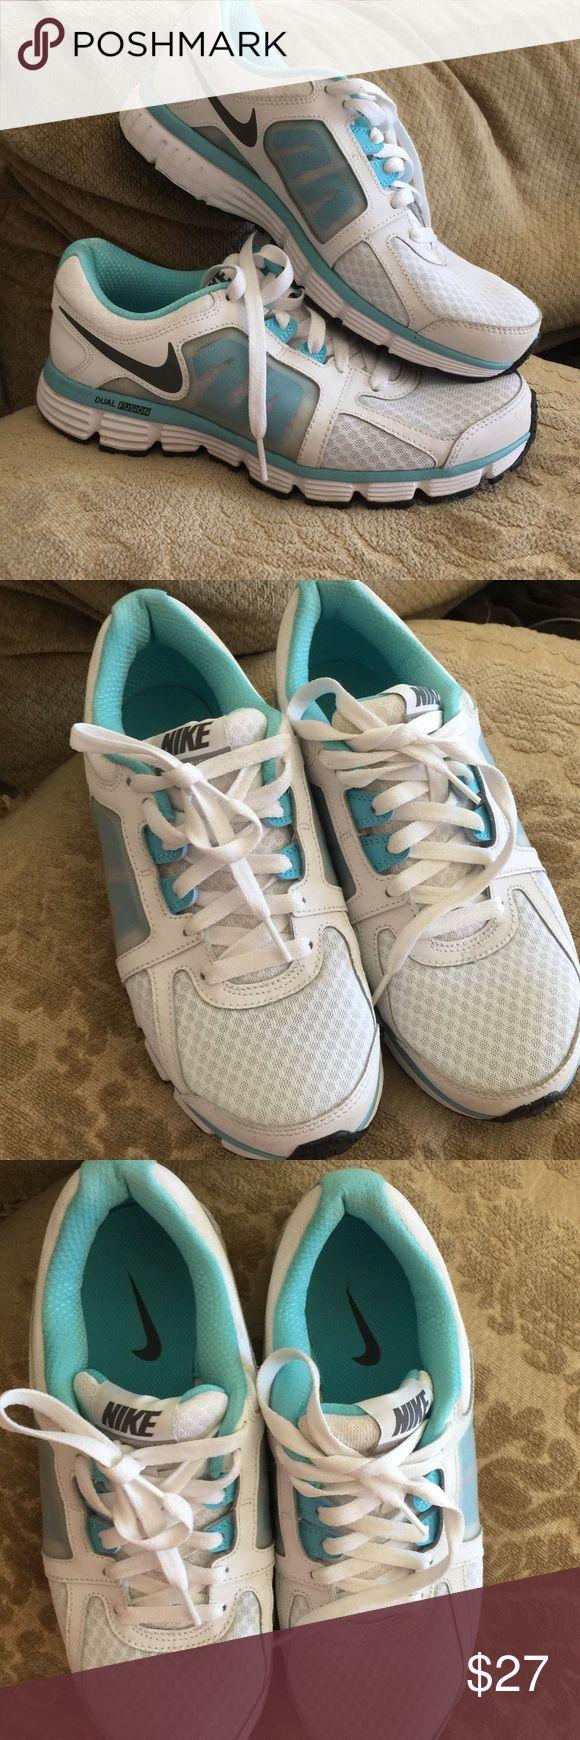 Nike dual fusion sz9 like new blue, white, black Nike dual fusion sz9 like new blue, white, black very comfy! Nike Shoes Athletic Shoes